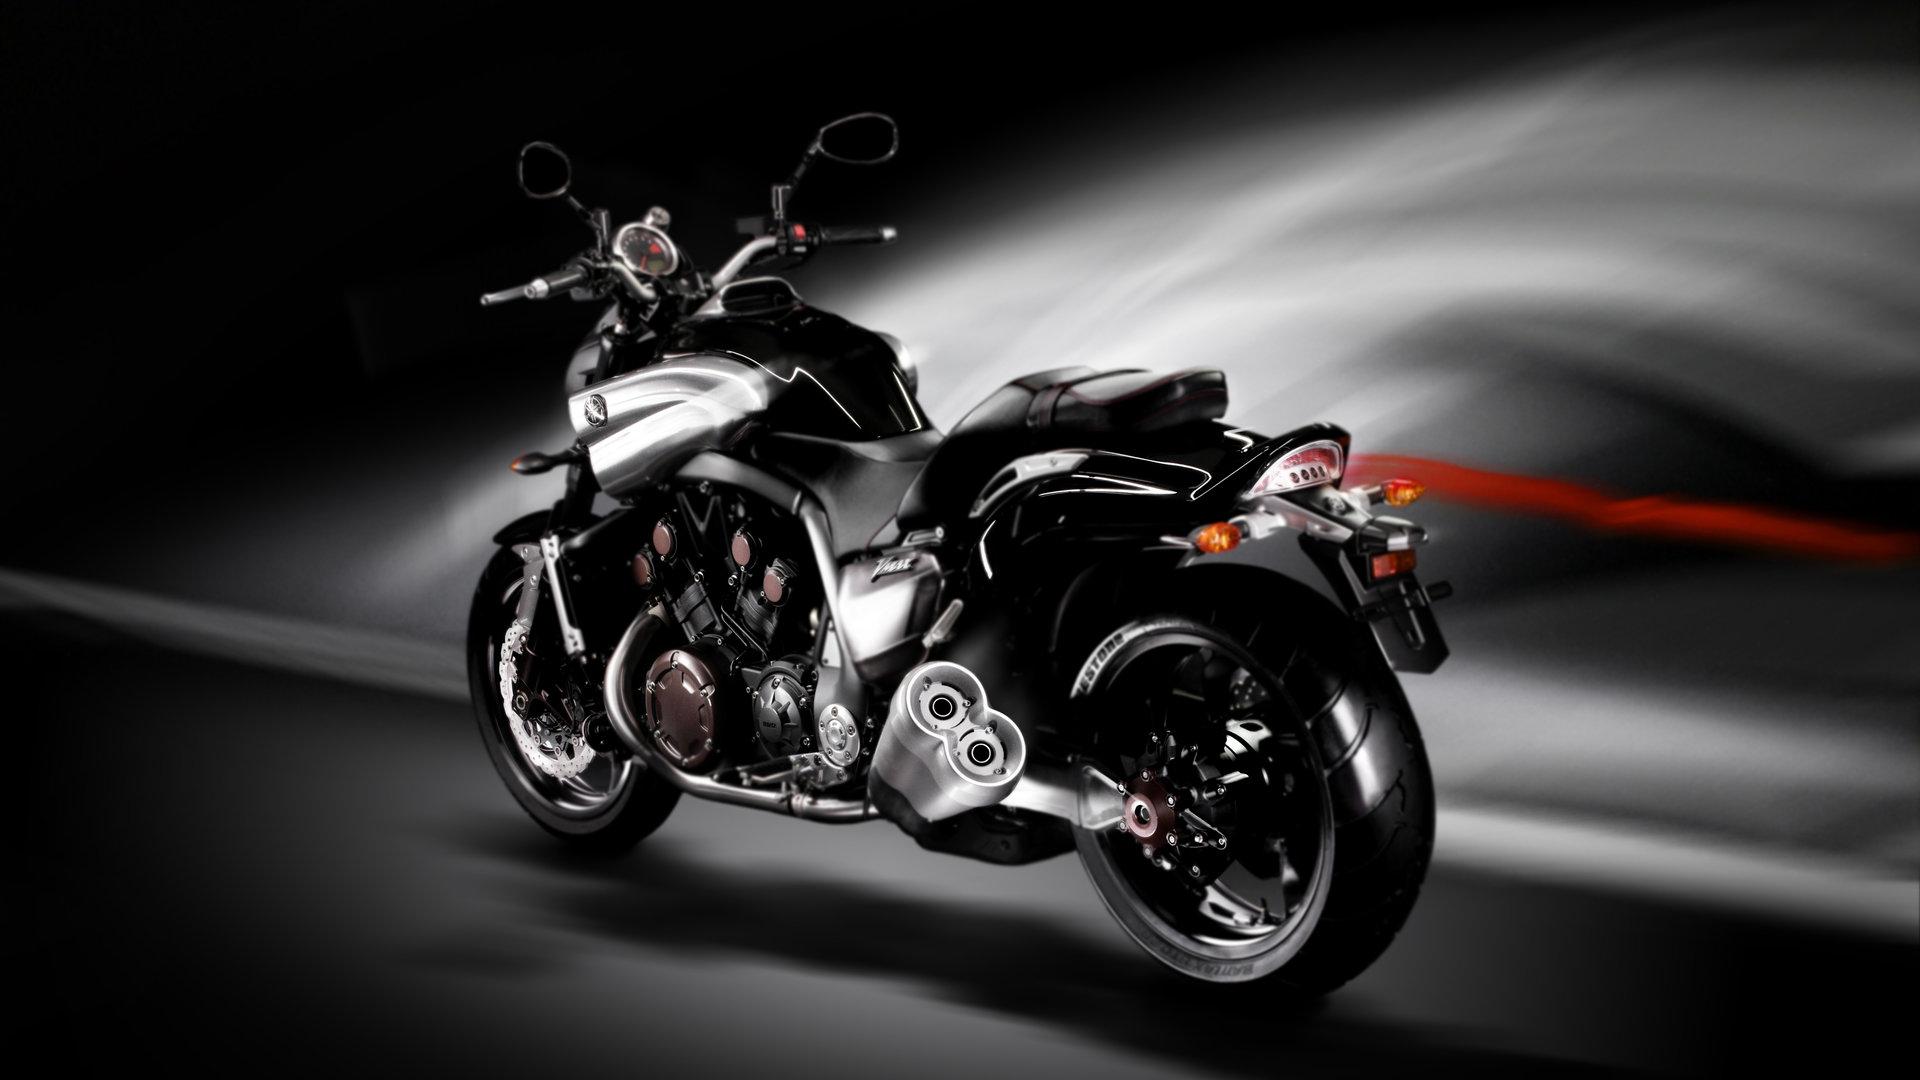 Yamaha VMAX 1700 2009 2